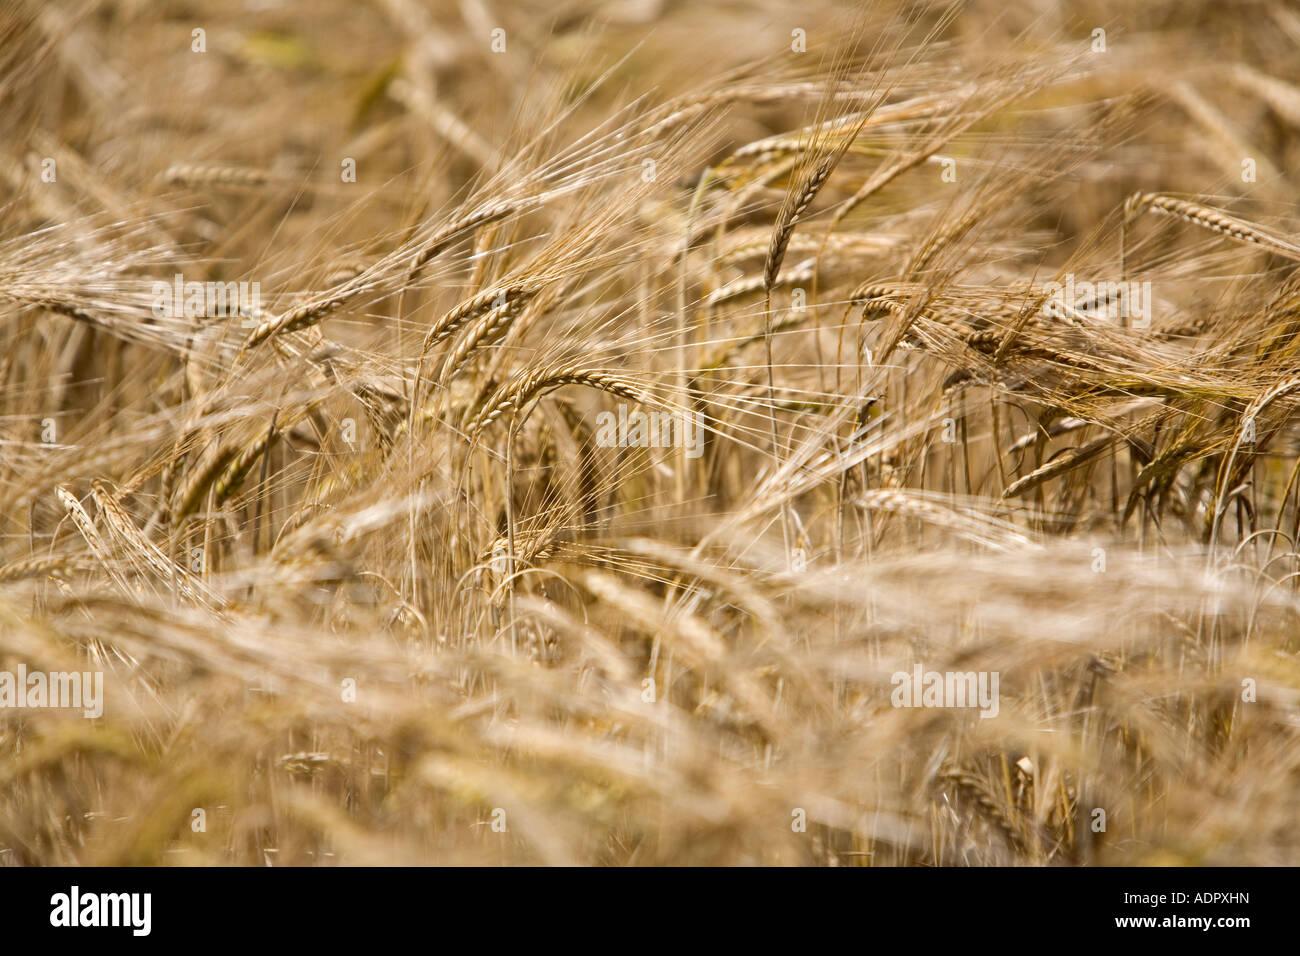 Vista cercana de la cebada madura Imagen De Stock